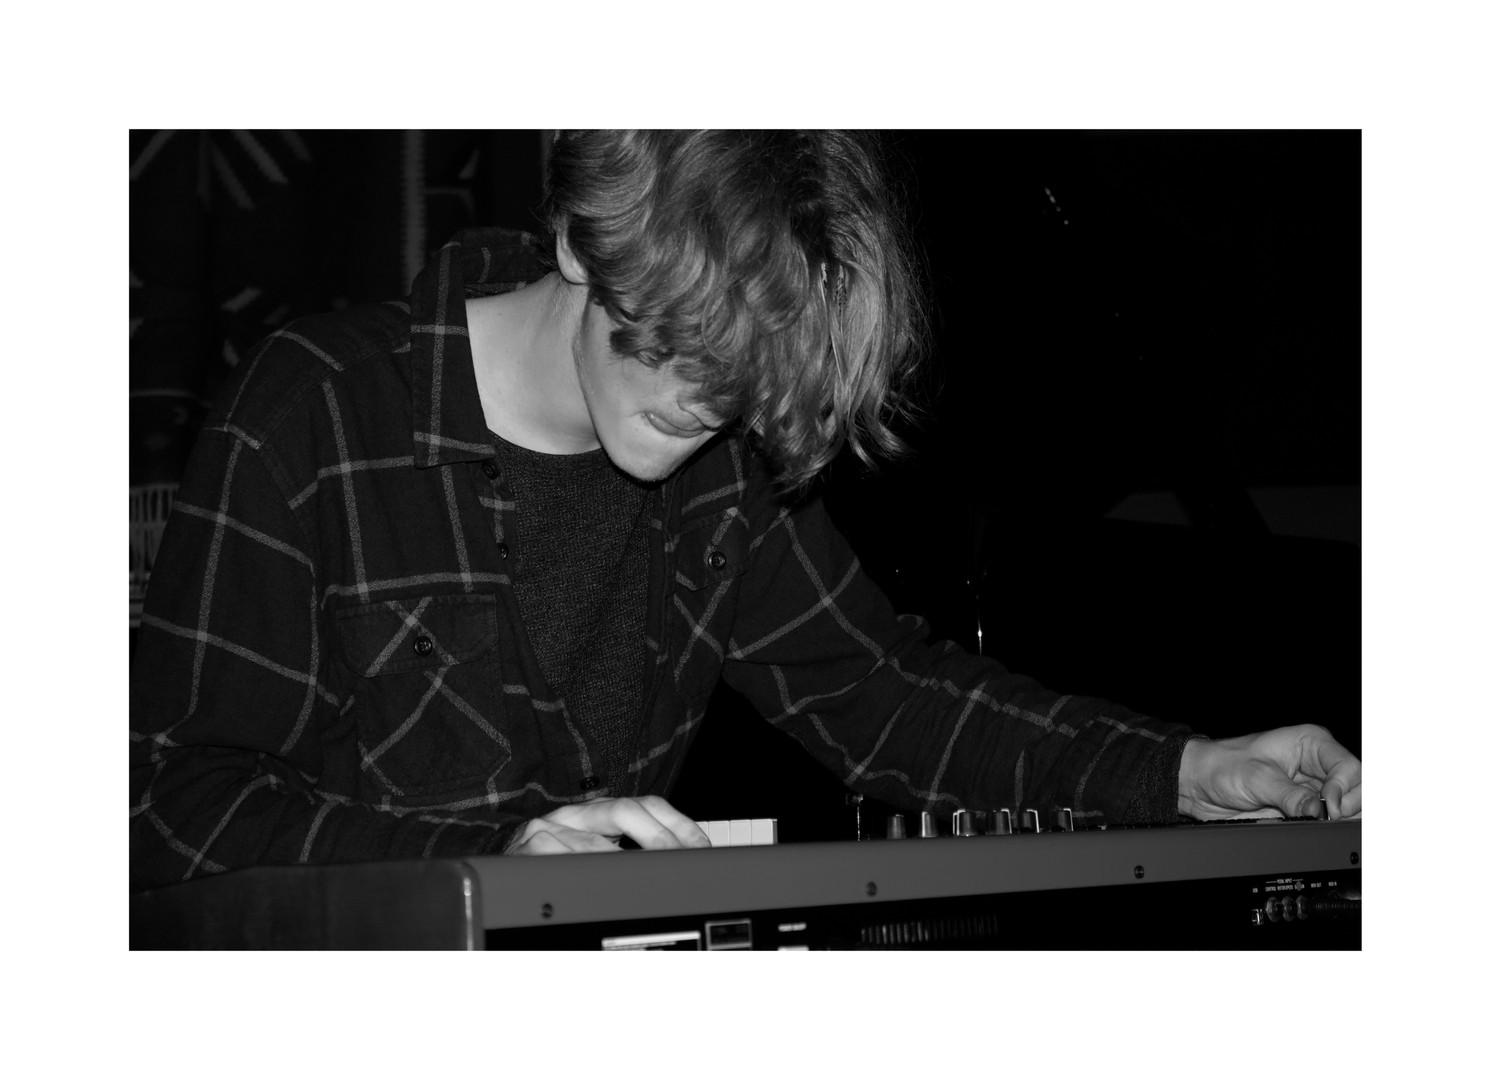 pianolitlit.jpg